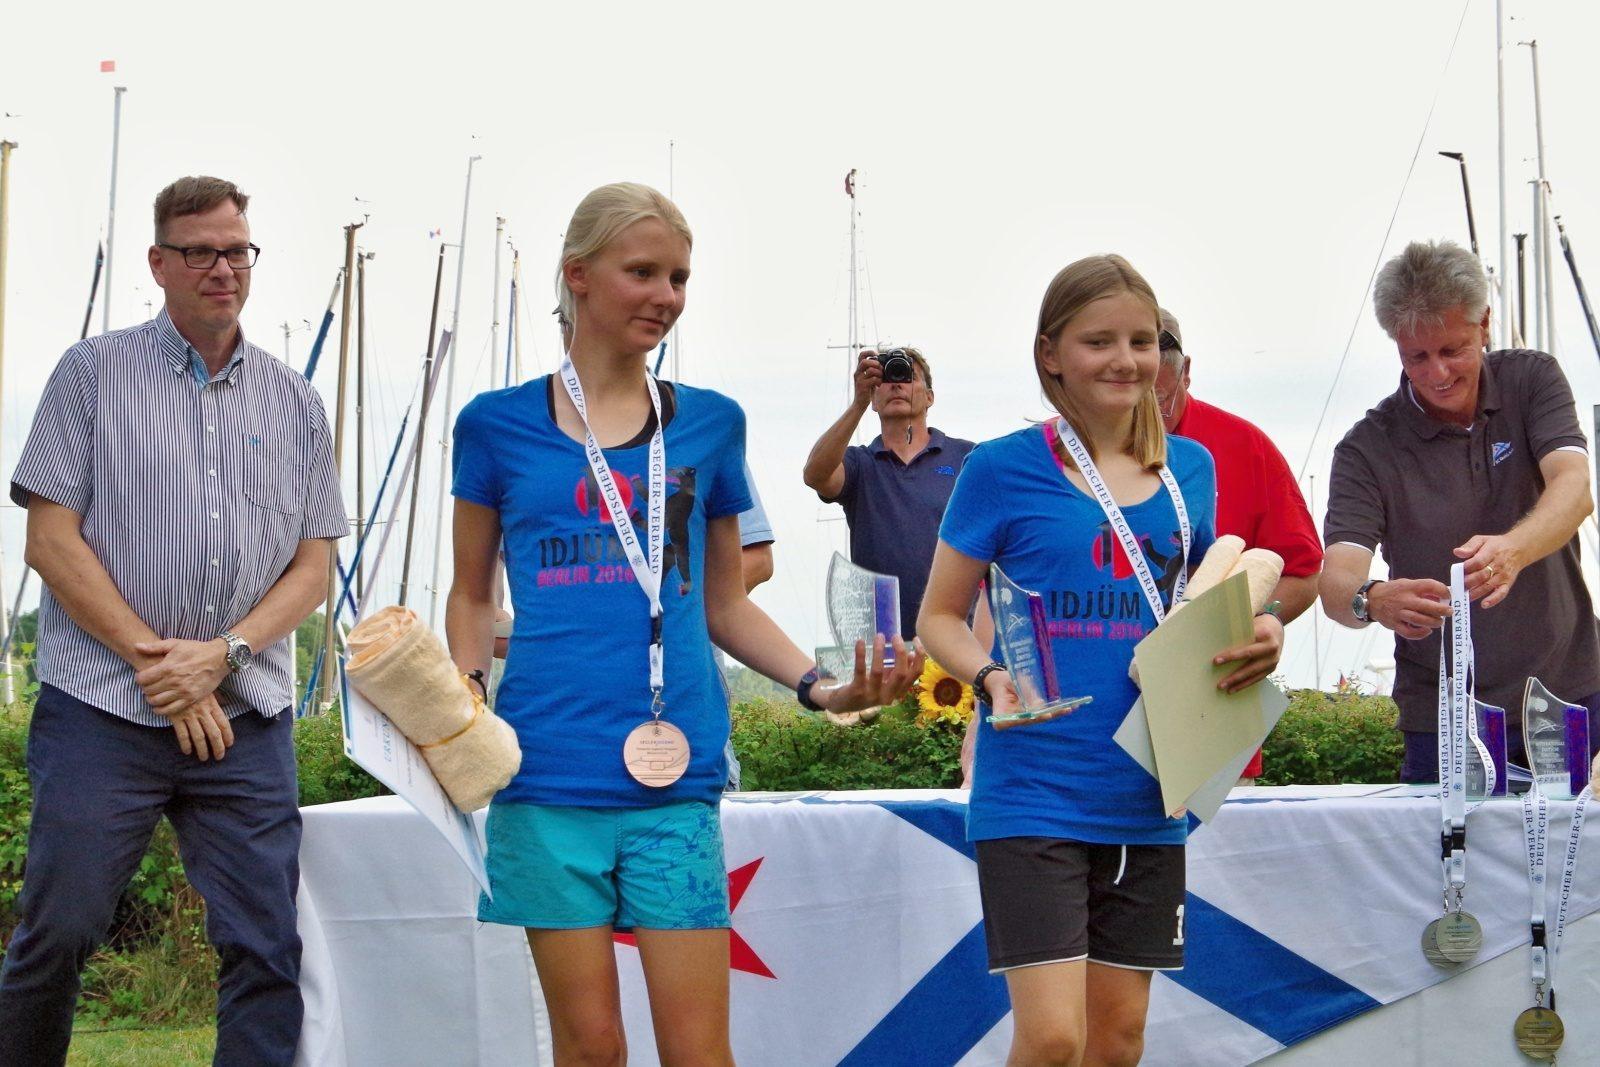 3. Platz GER 684: Charlotte Müldner, Josefine Henkel - IDJüM 2016 im Teeny im SC Gothia e.V. in Berlin Spandau, 29.Juli 2016